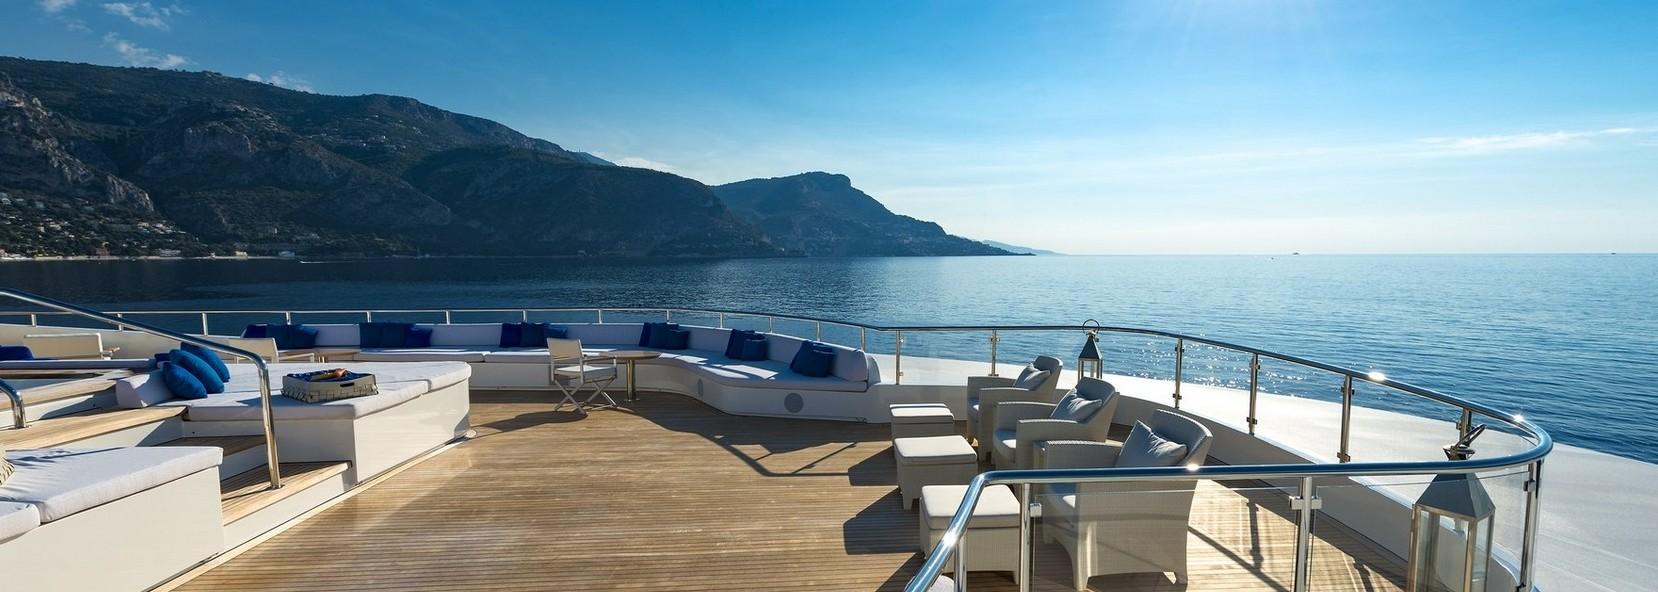 Yacht Charter Worldwide